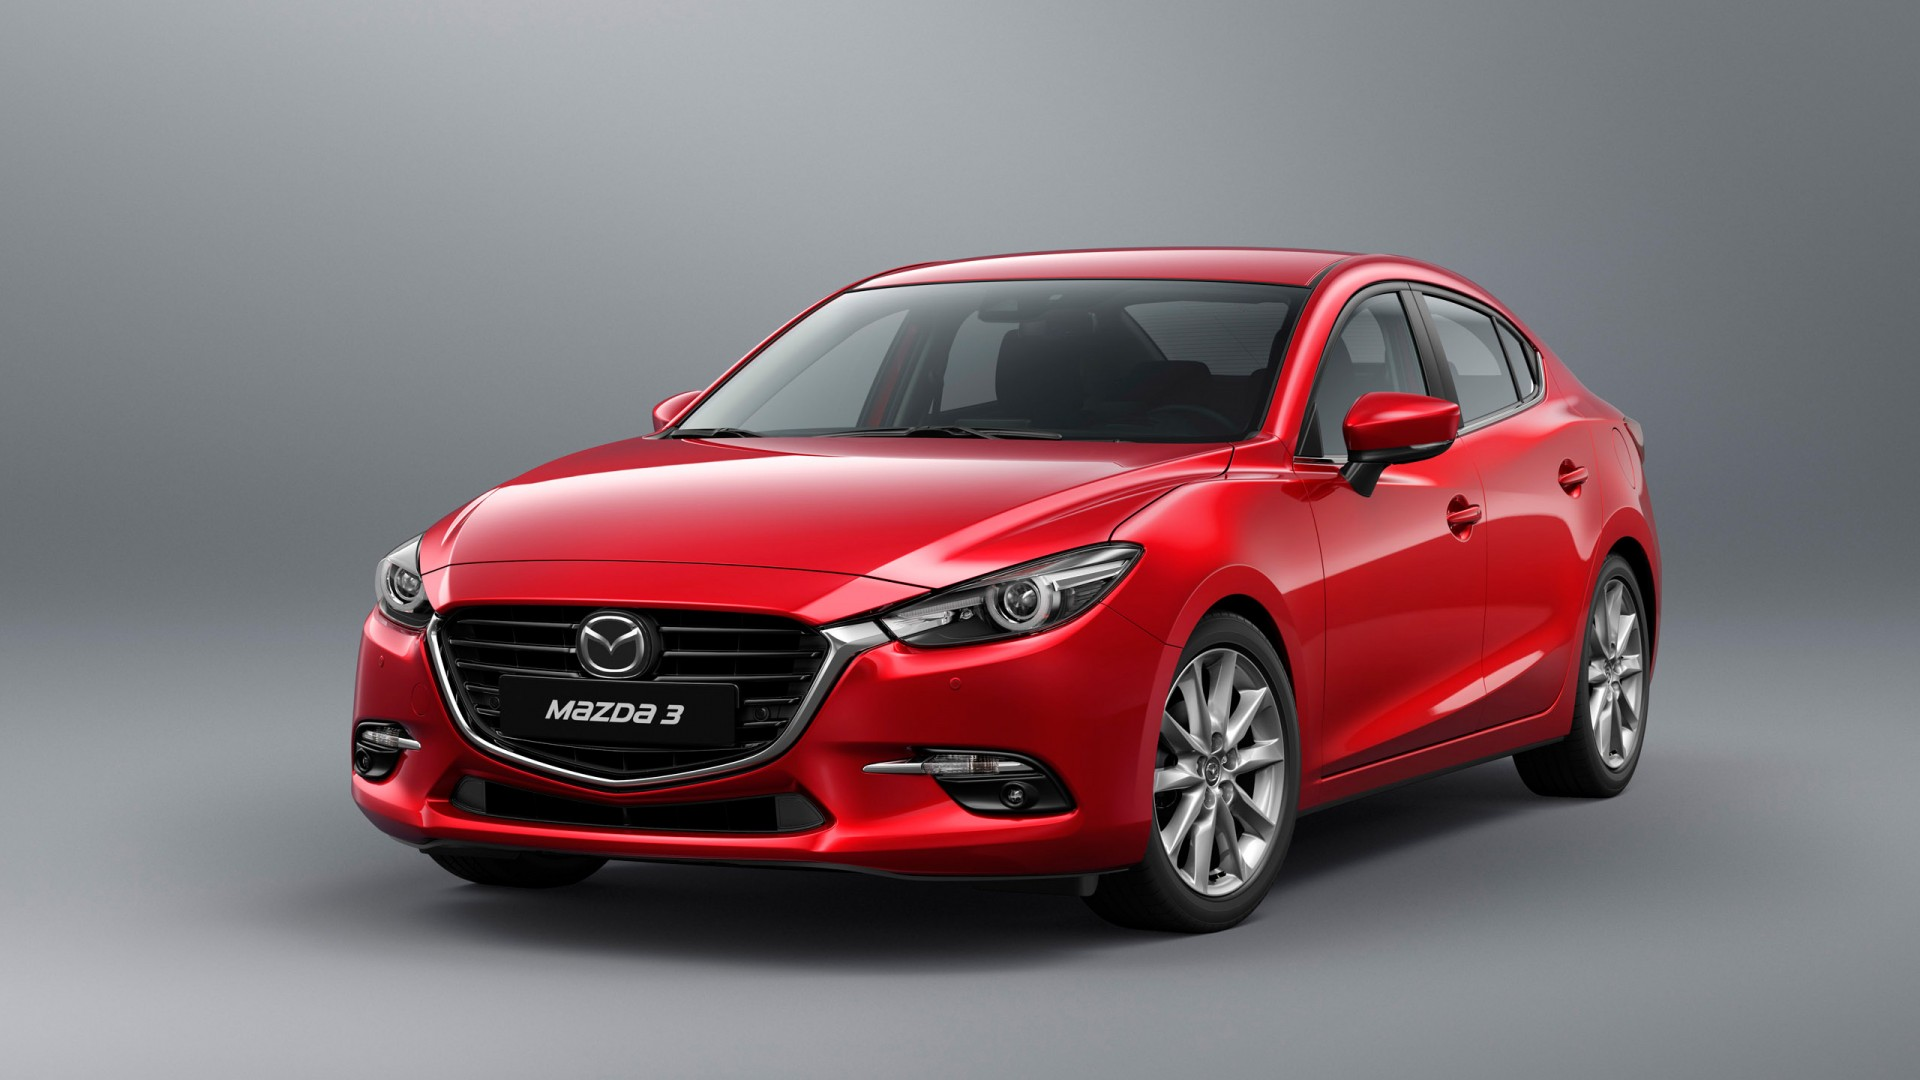 2017 Mazda 3 Wallpaper HD Car Wallpapers ID 7063